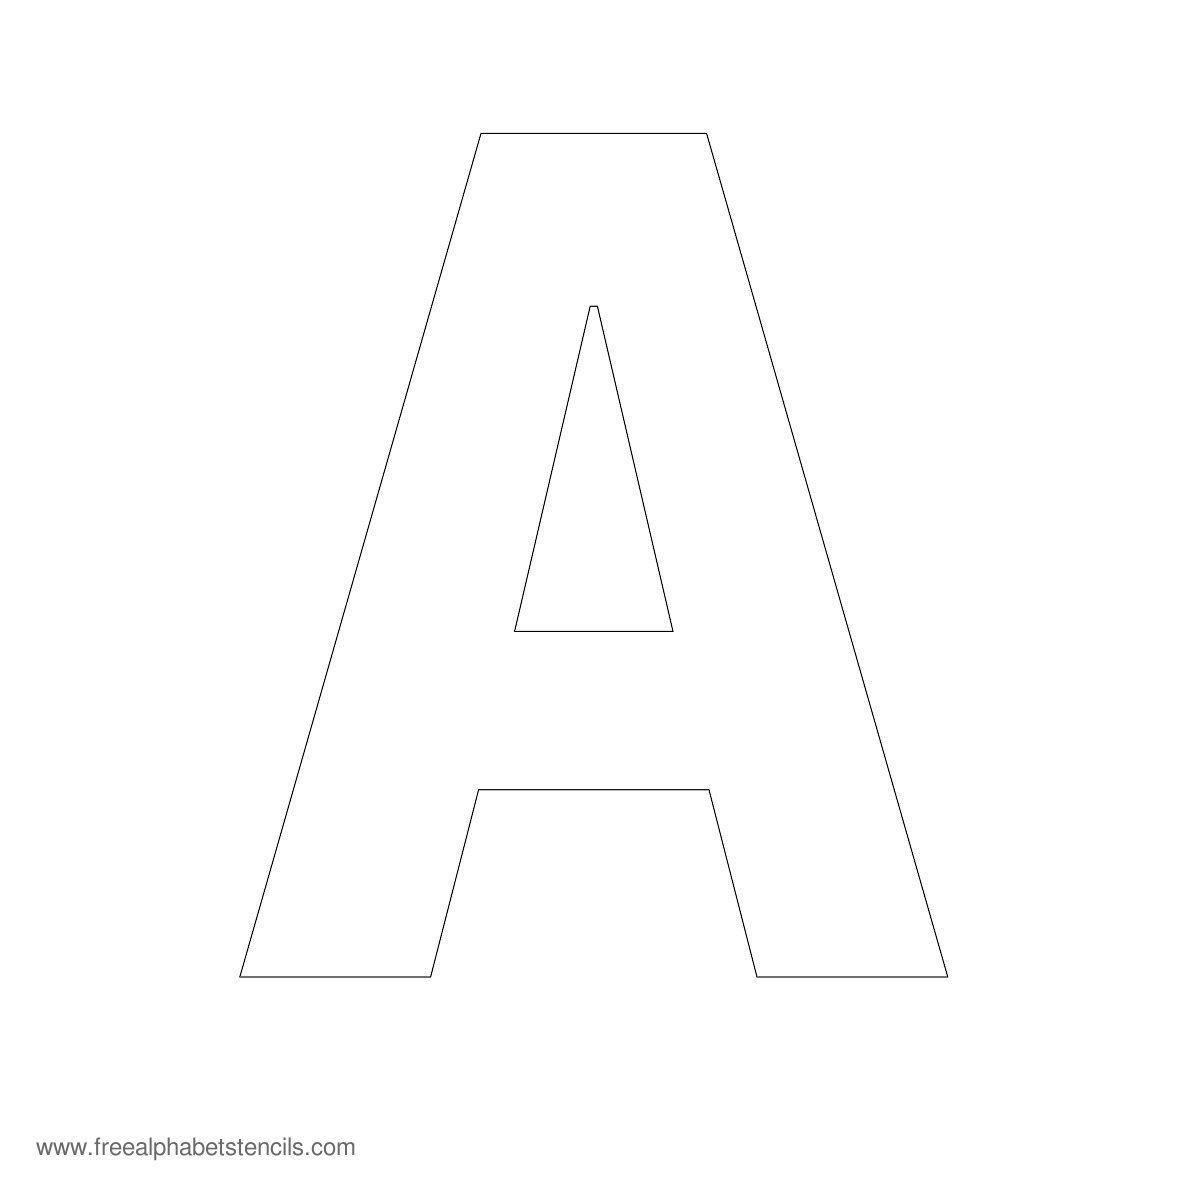 Large Alphabet Stencils   Freealphabetstencils - Free Printable 8 Inch Letters